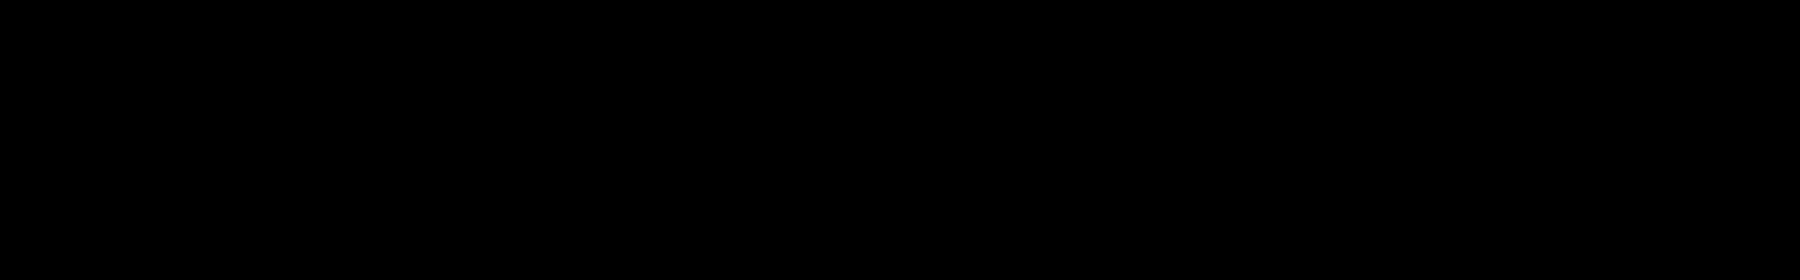 T.I.M audio waveform